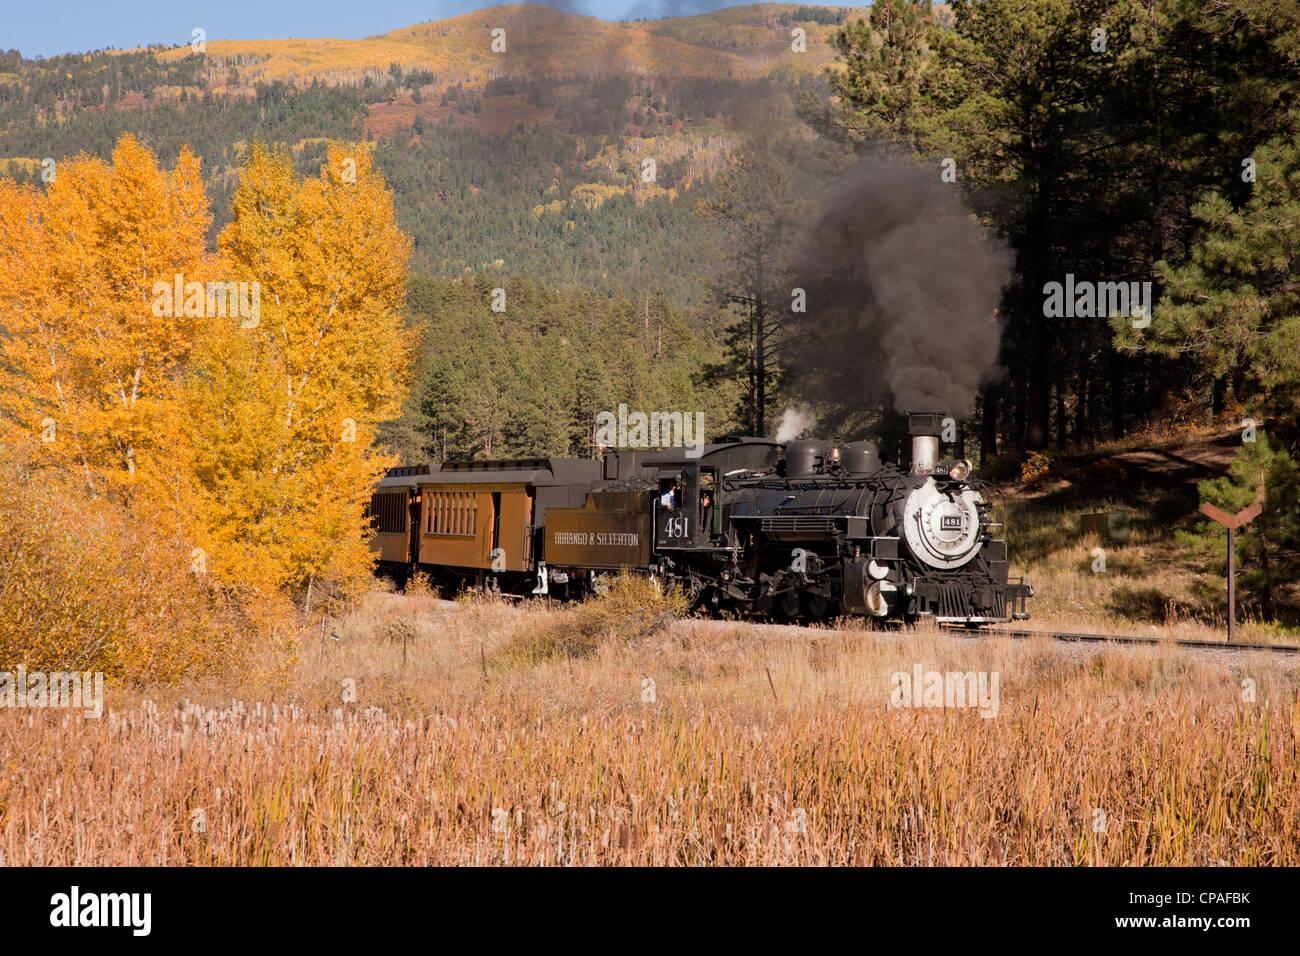 USA, Colorado. The Durango and Silverton Narrow Gauge Railroad chugs along carrying tourists - Stock Image